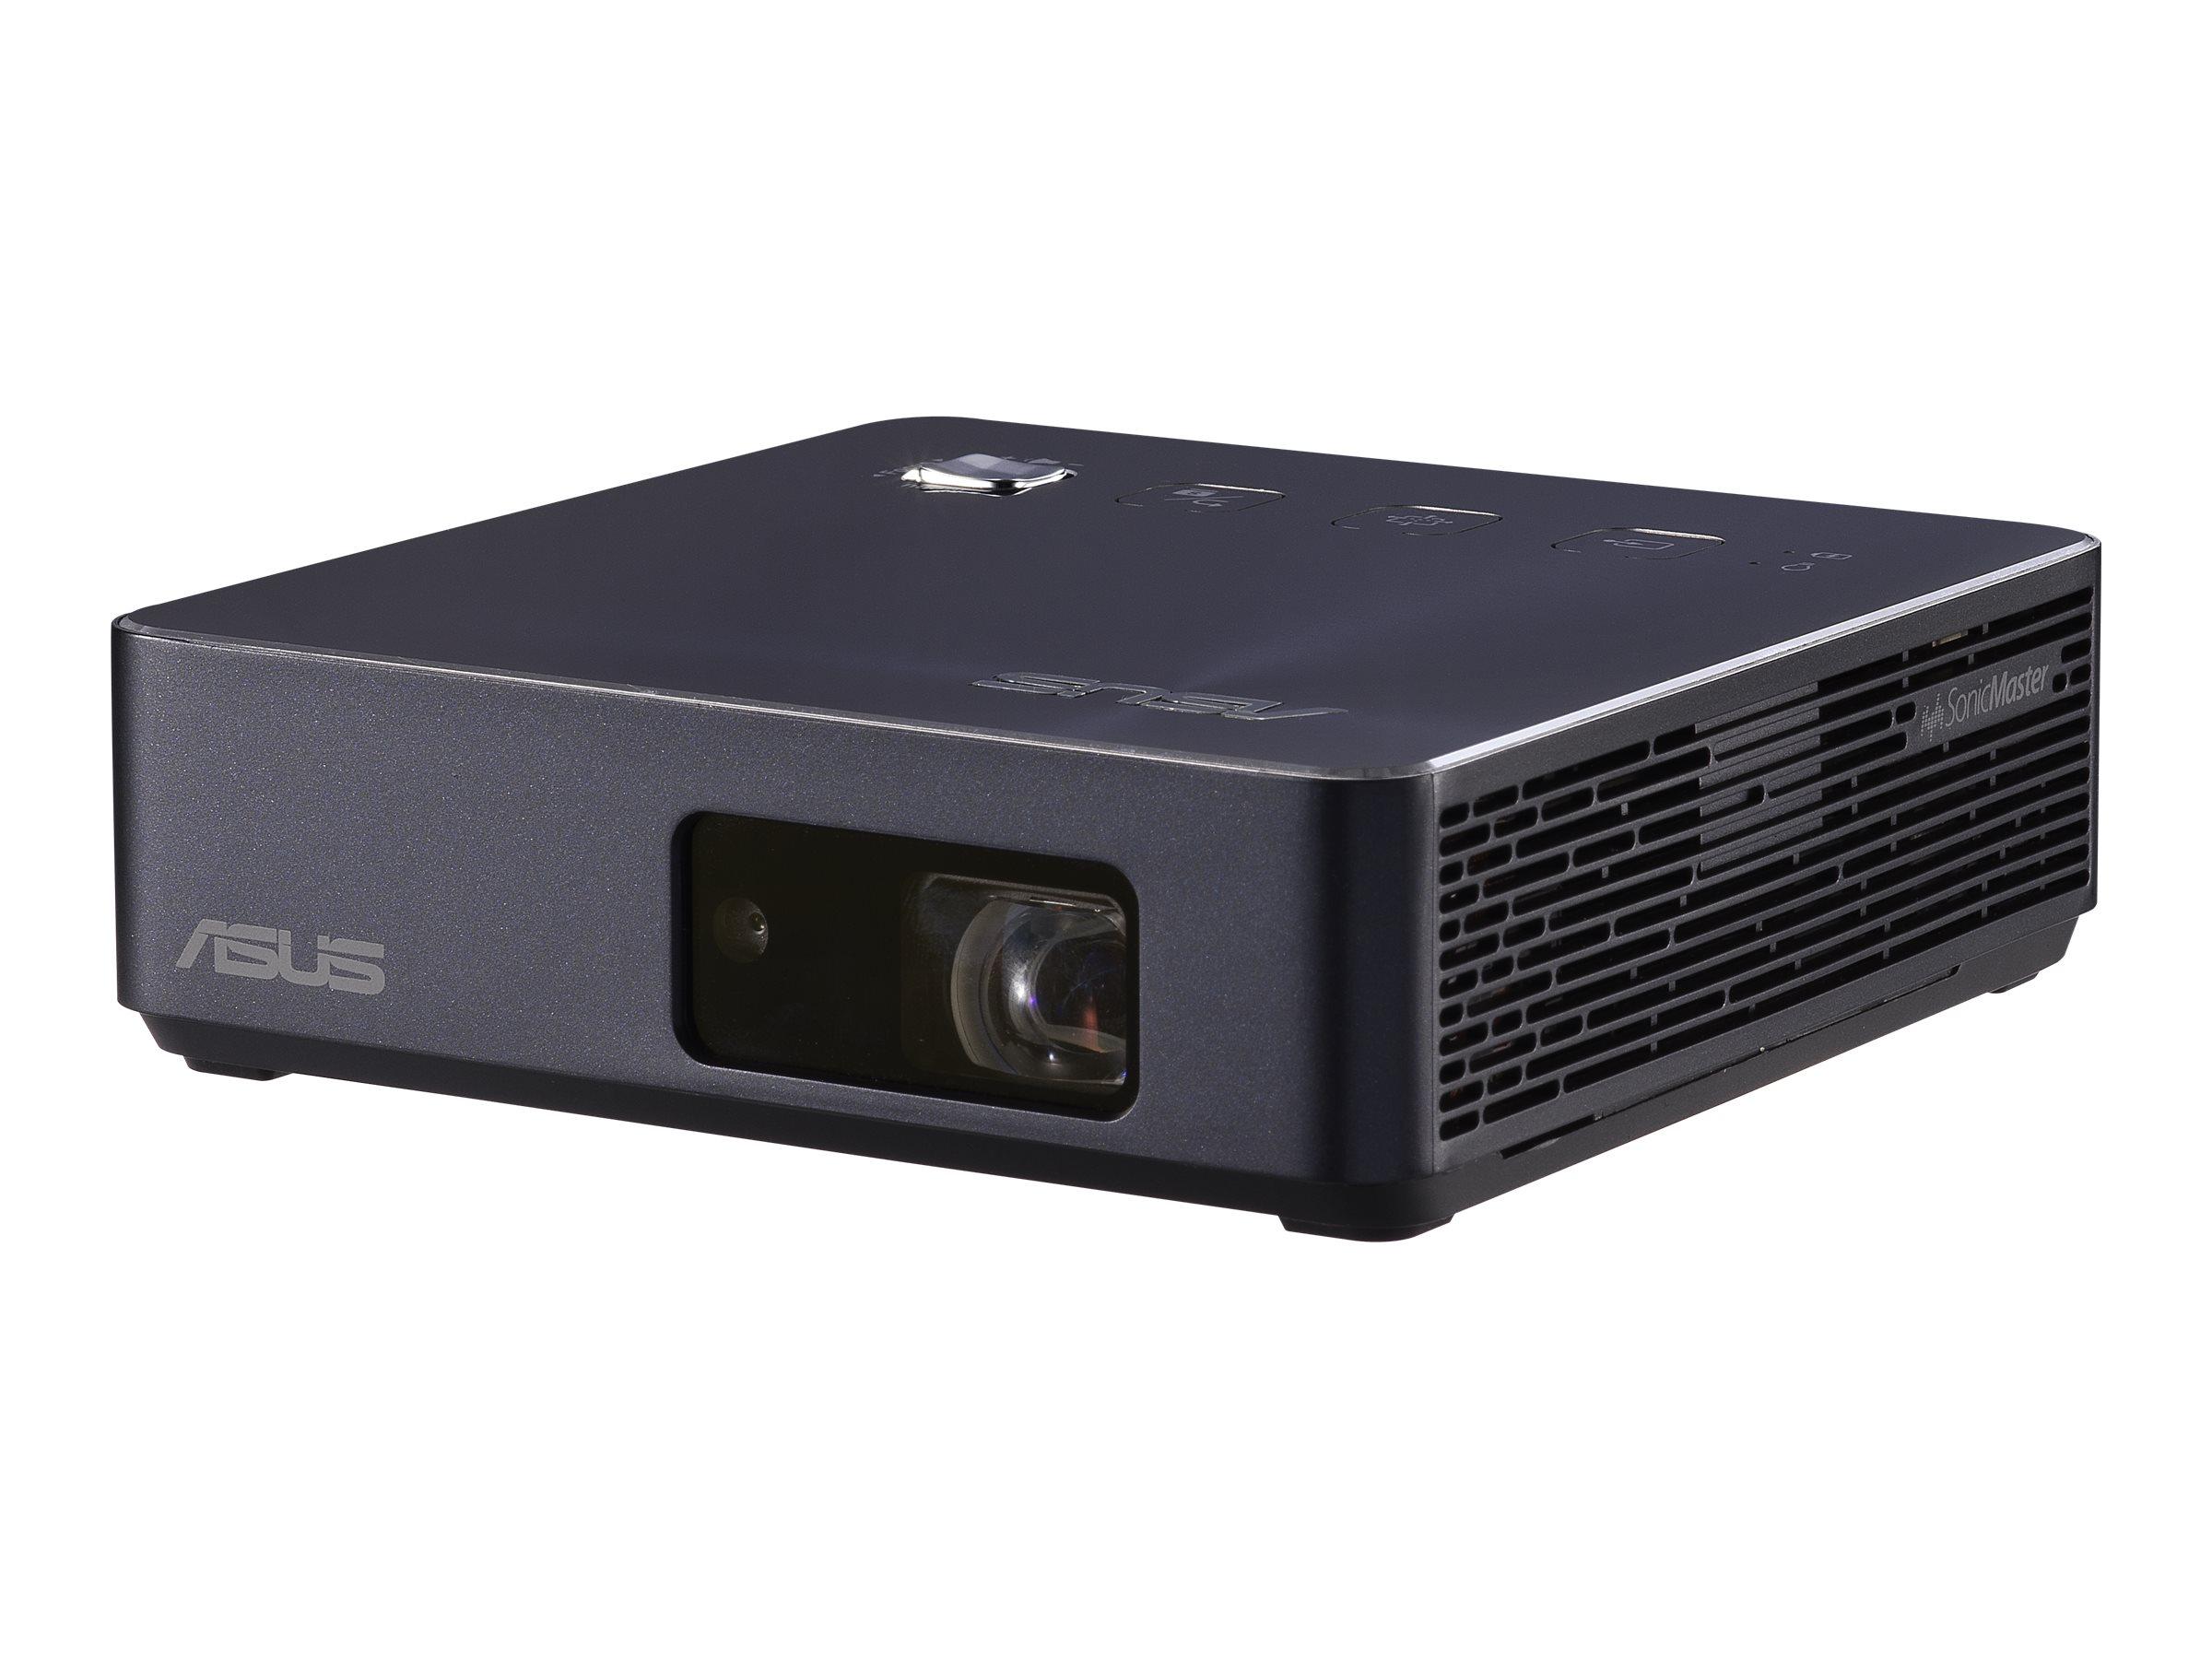 ASUS ZenBeam S2 - DLP-Projektor - RGB LED - 3D - 500 lm - 1280 x 720